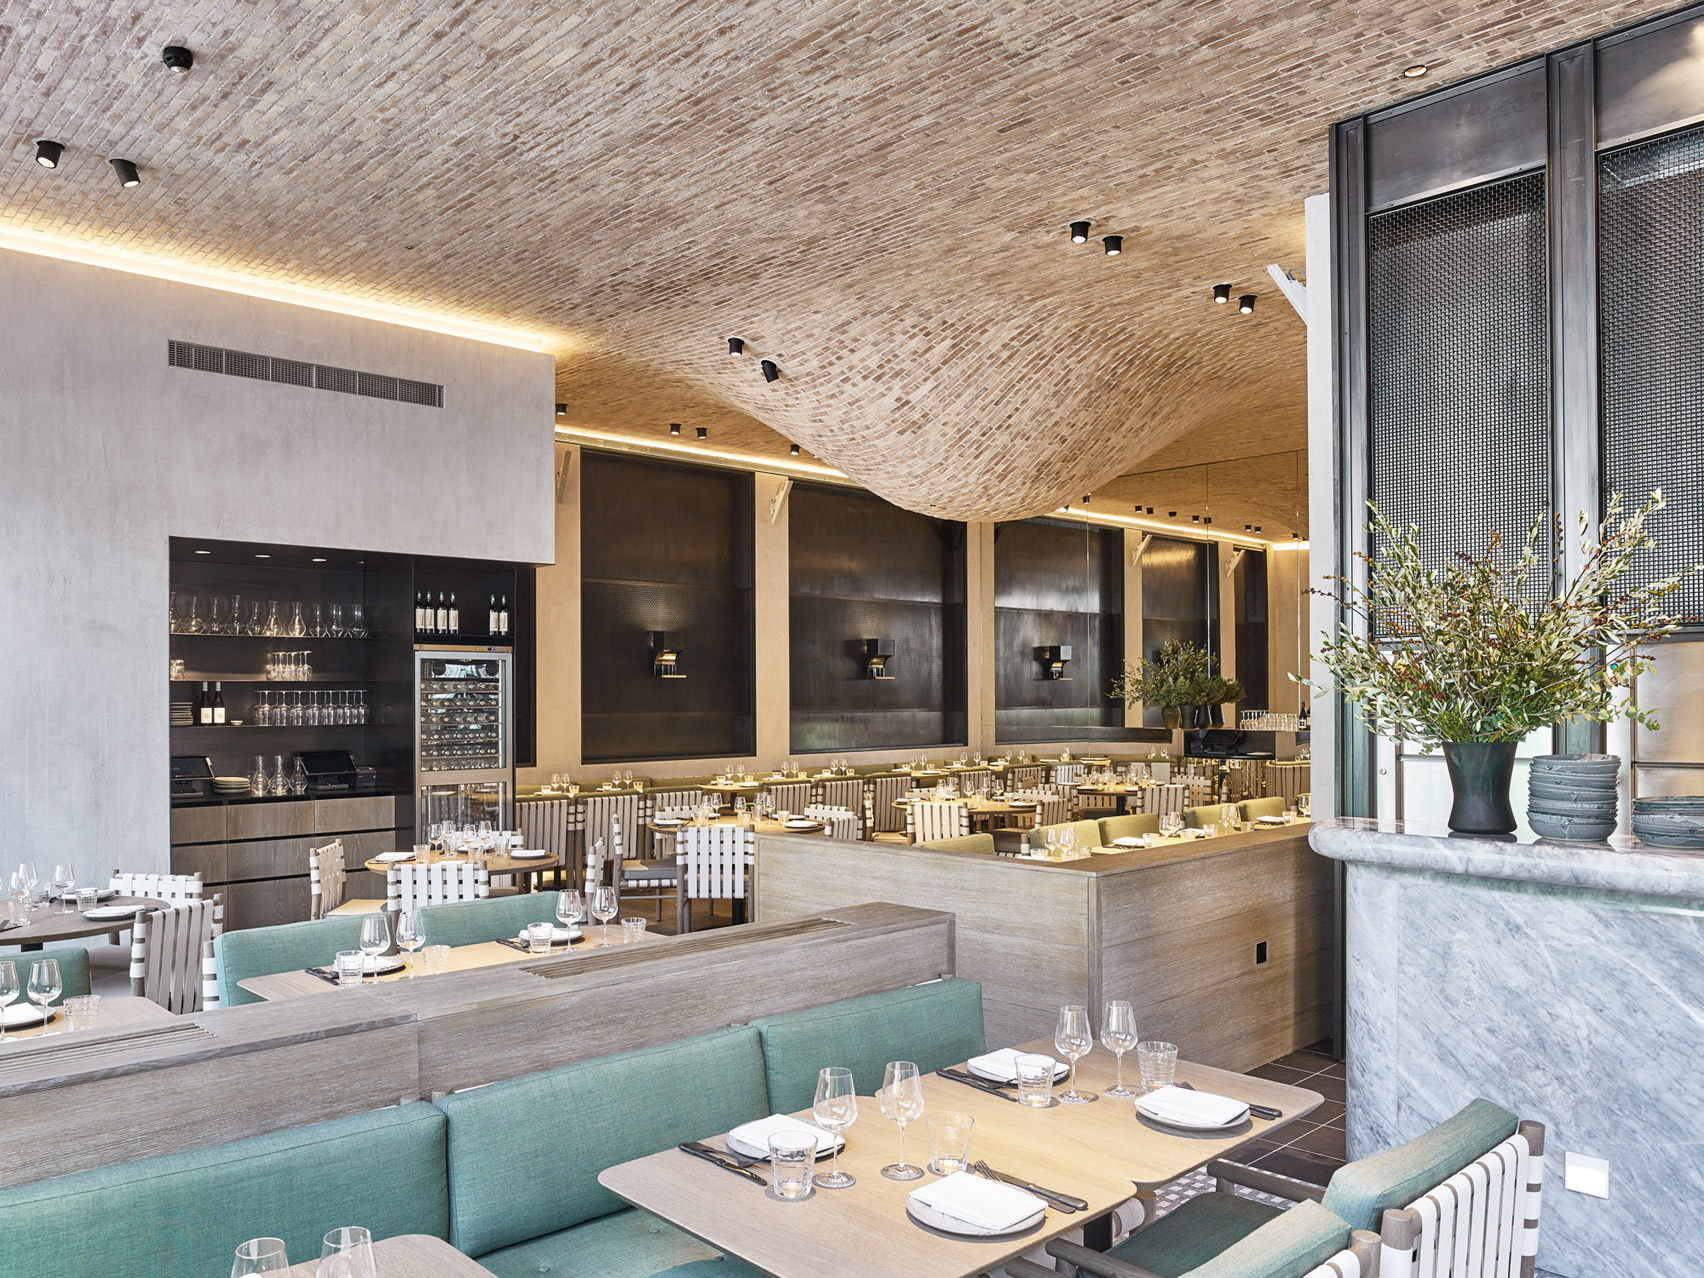 fucina-restaurant-andy-martin-architecture-interiors-london_dezeen_1704_col_6